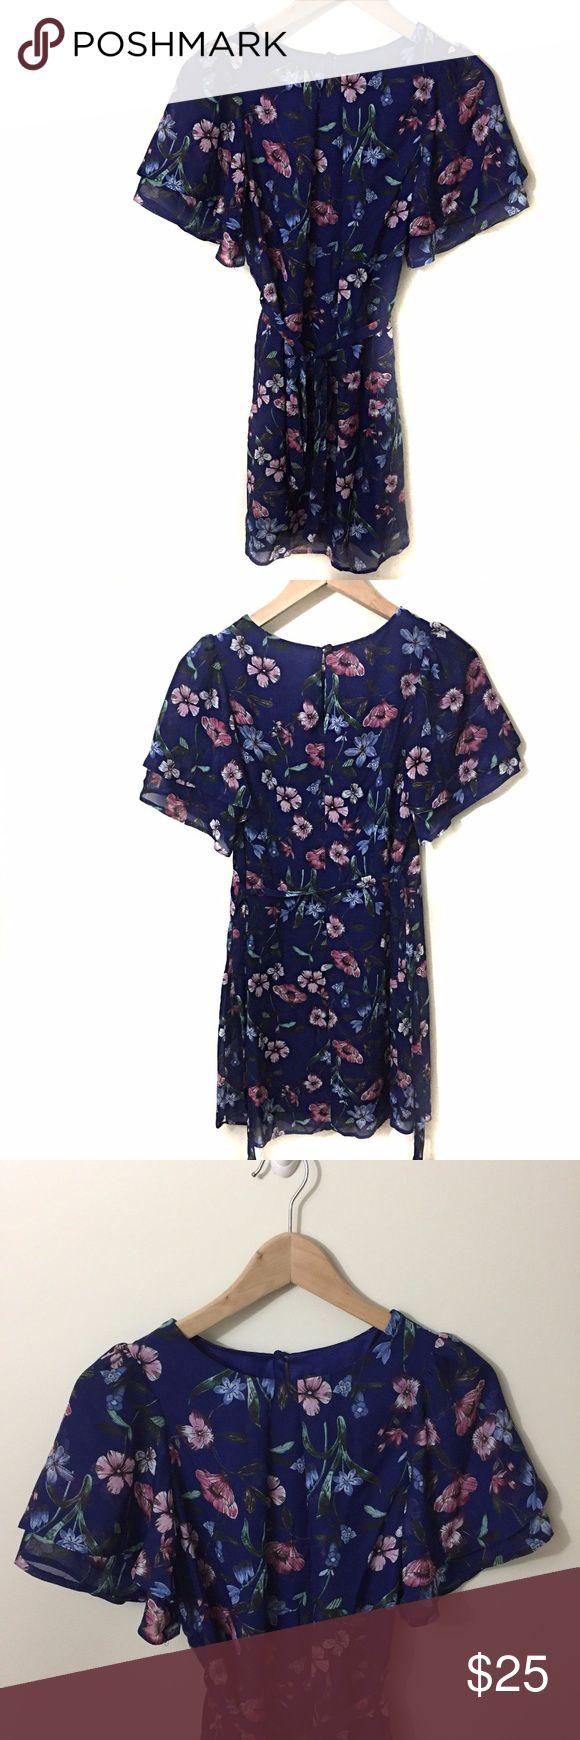 "Primark Blue Floral Dress Size 2 Primark blue floral dress with a self-tie belt, size 2.  New without tags.  Lined. Length 33"" Armpit to armpit 16"" Primark Dresses"